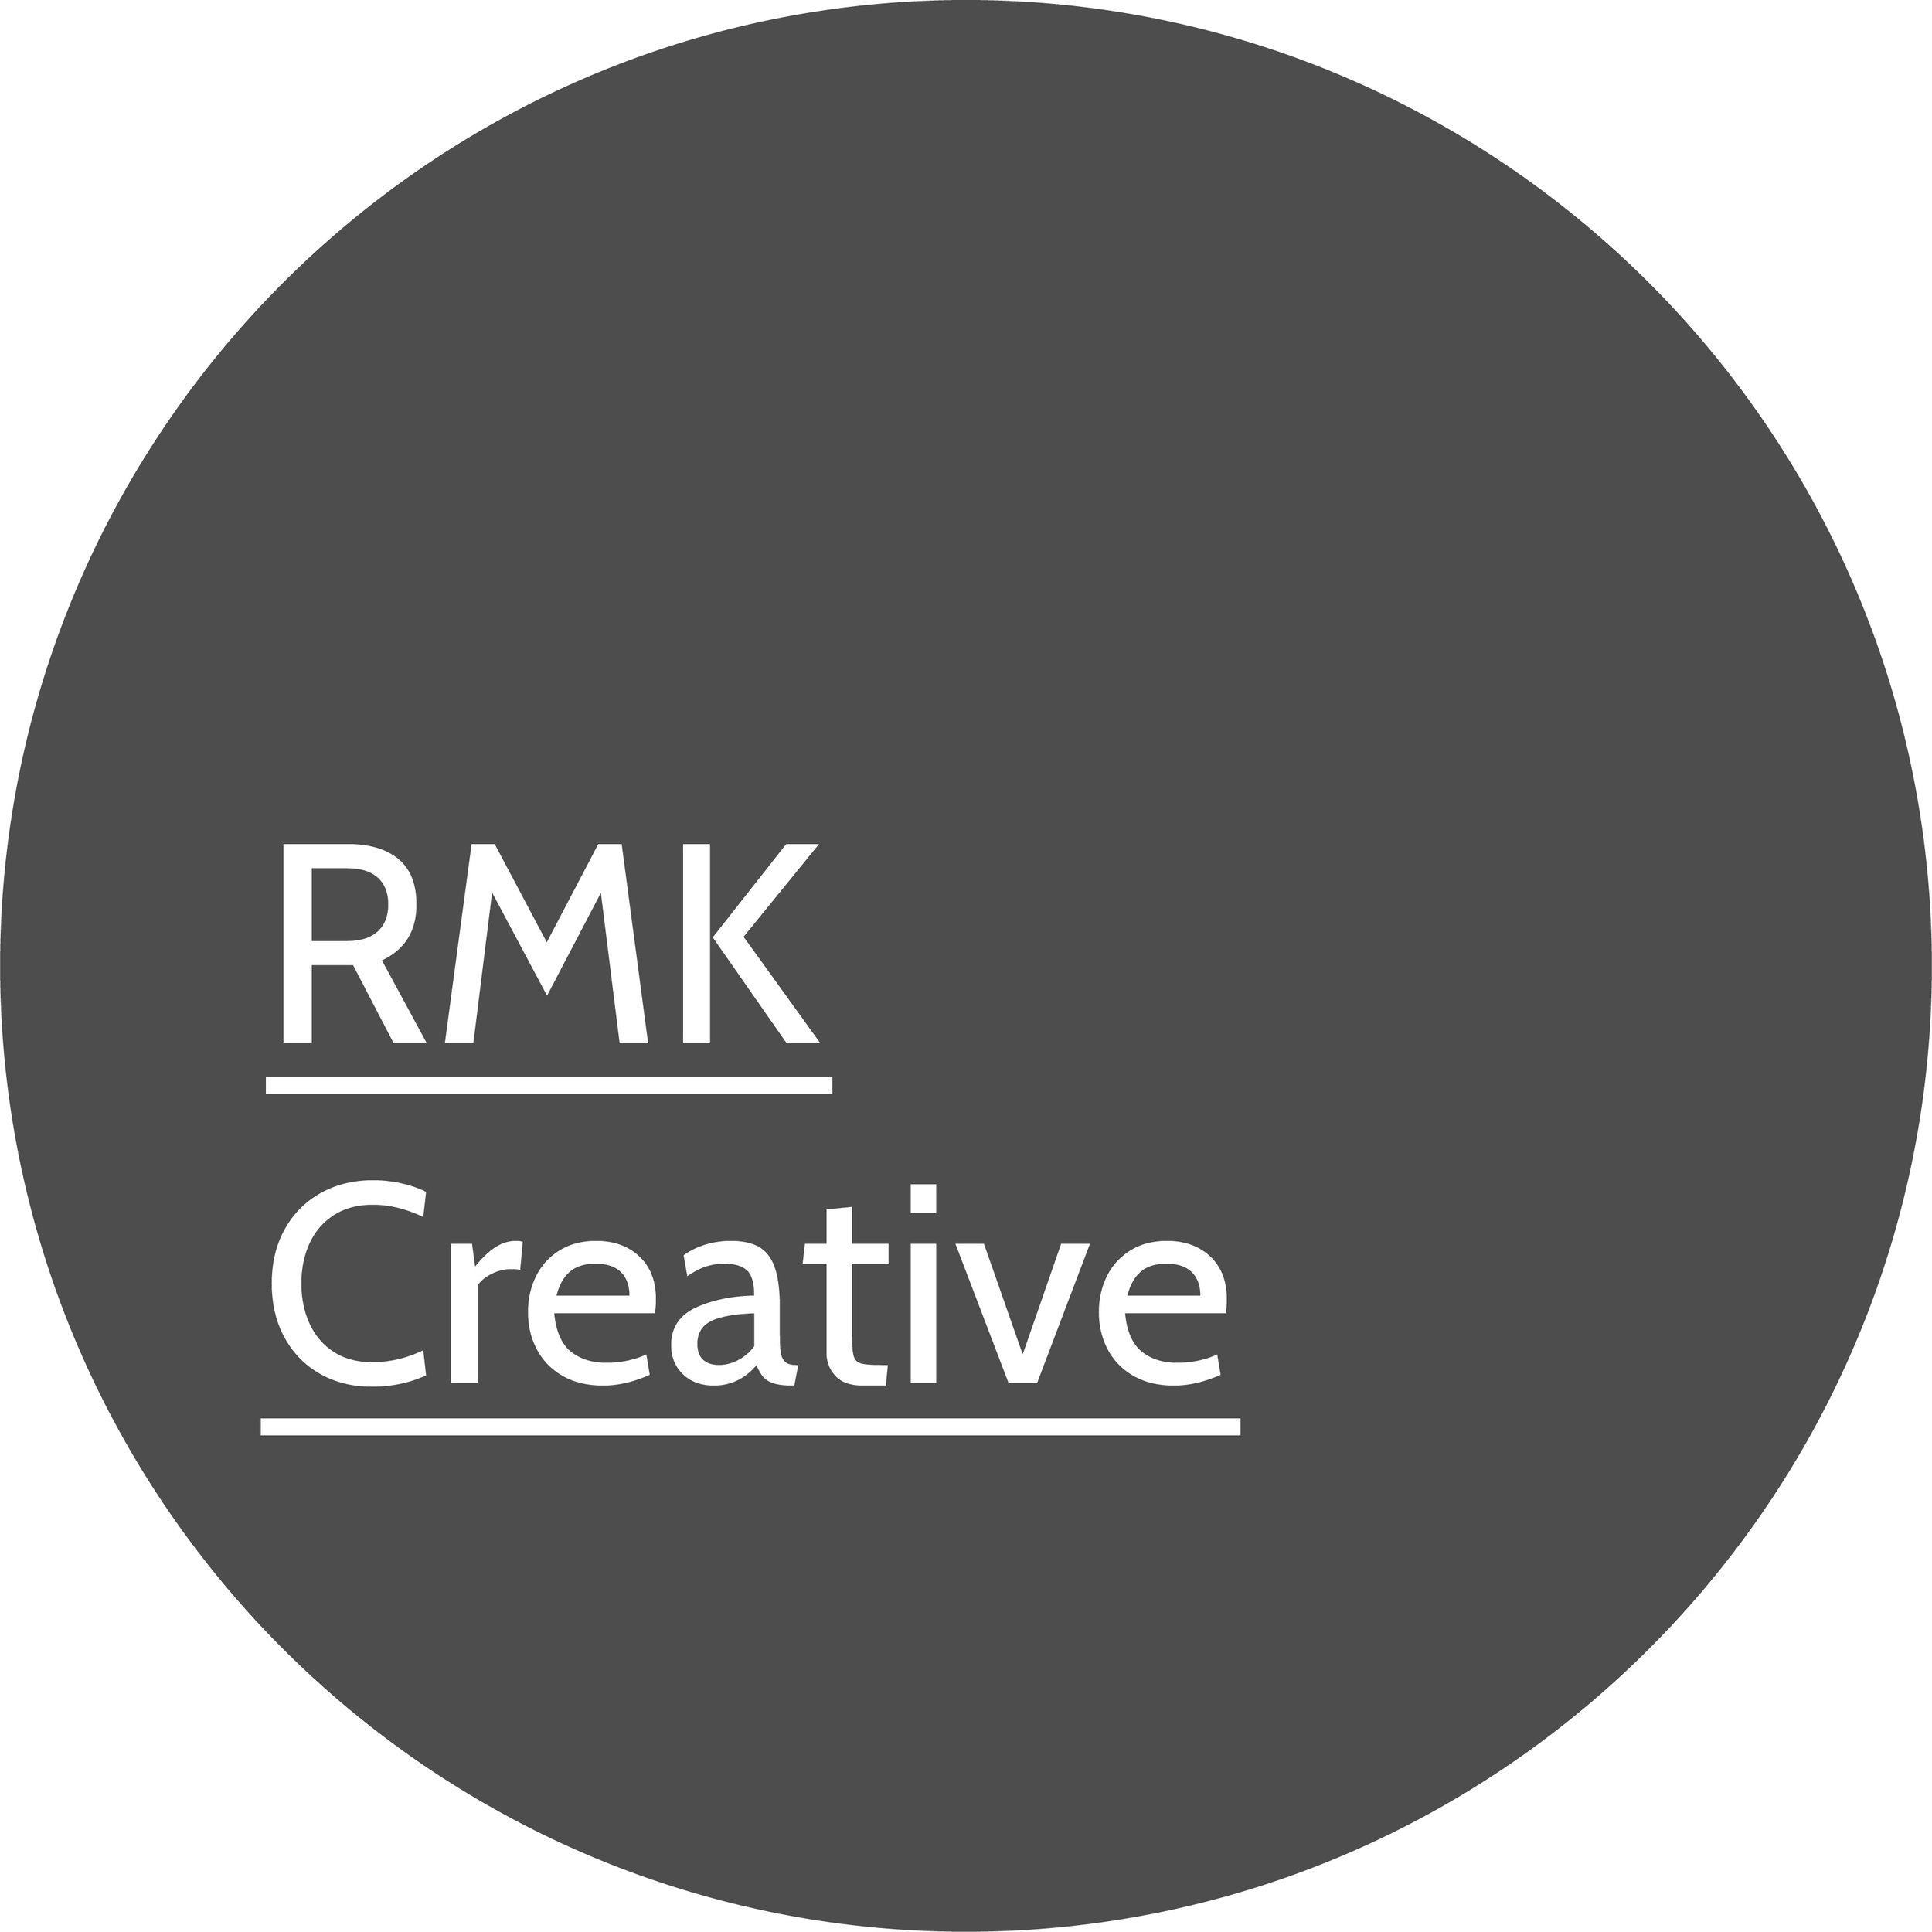 RMK Creative circle underlined.jpg